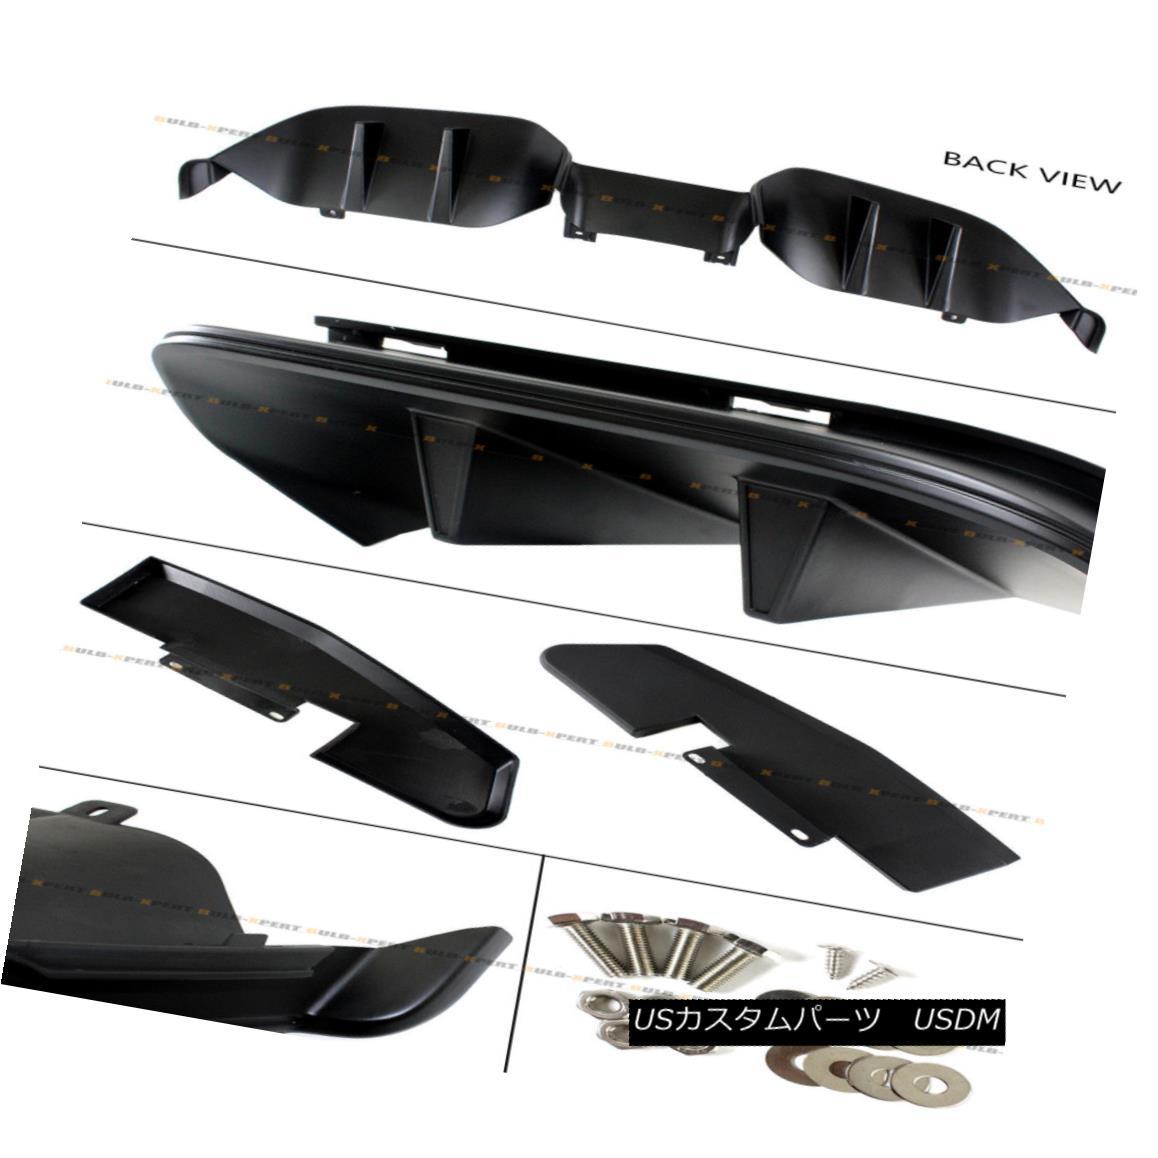 Fit Talon Bolt On Carbon Fiber Texture Matte Finish ABS Rear Bumper Diffuser